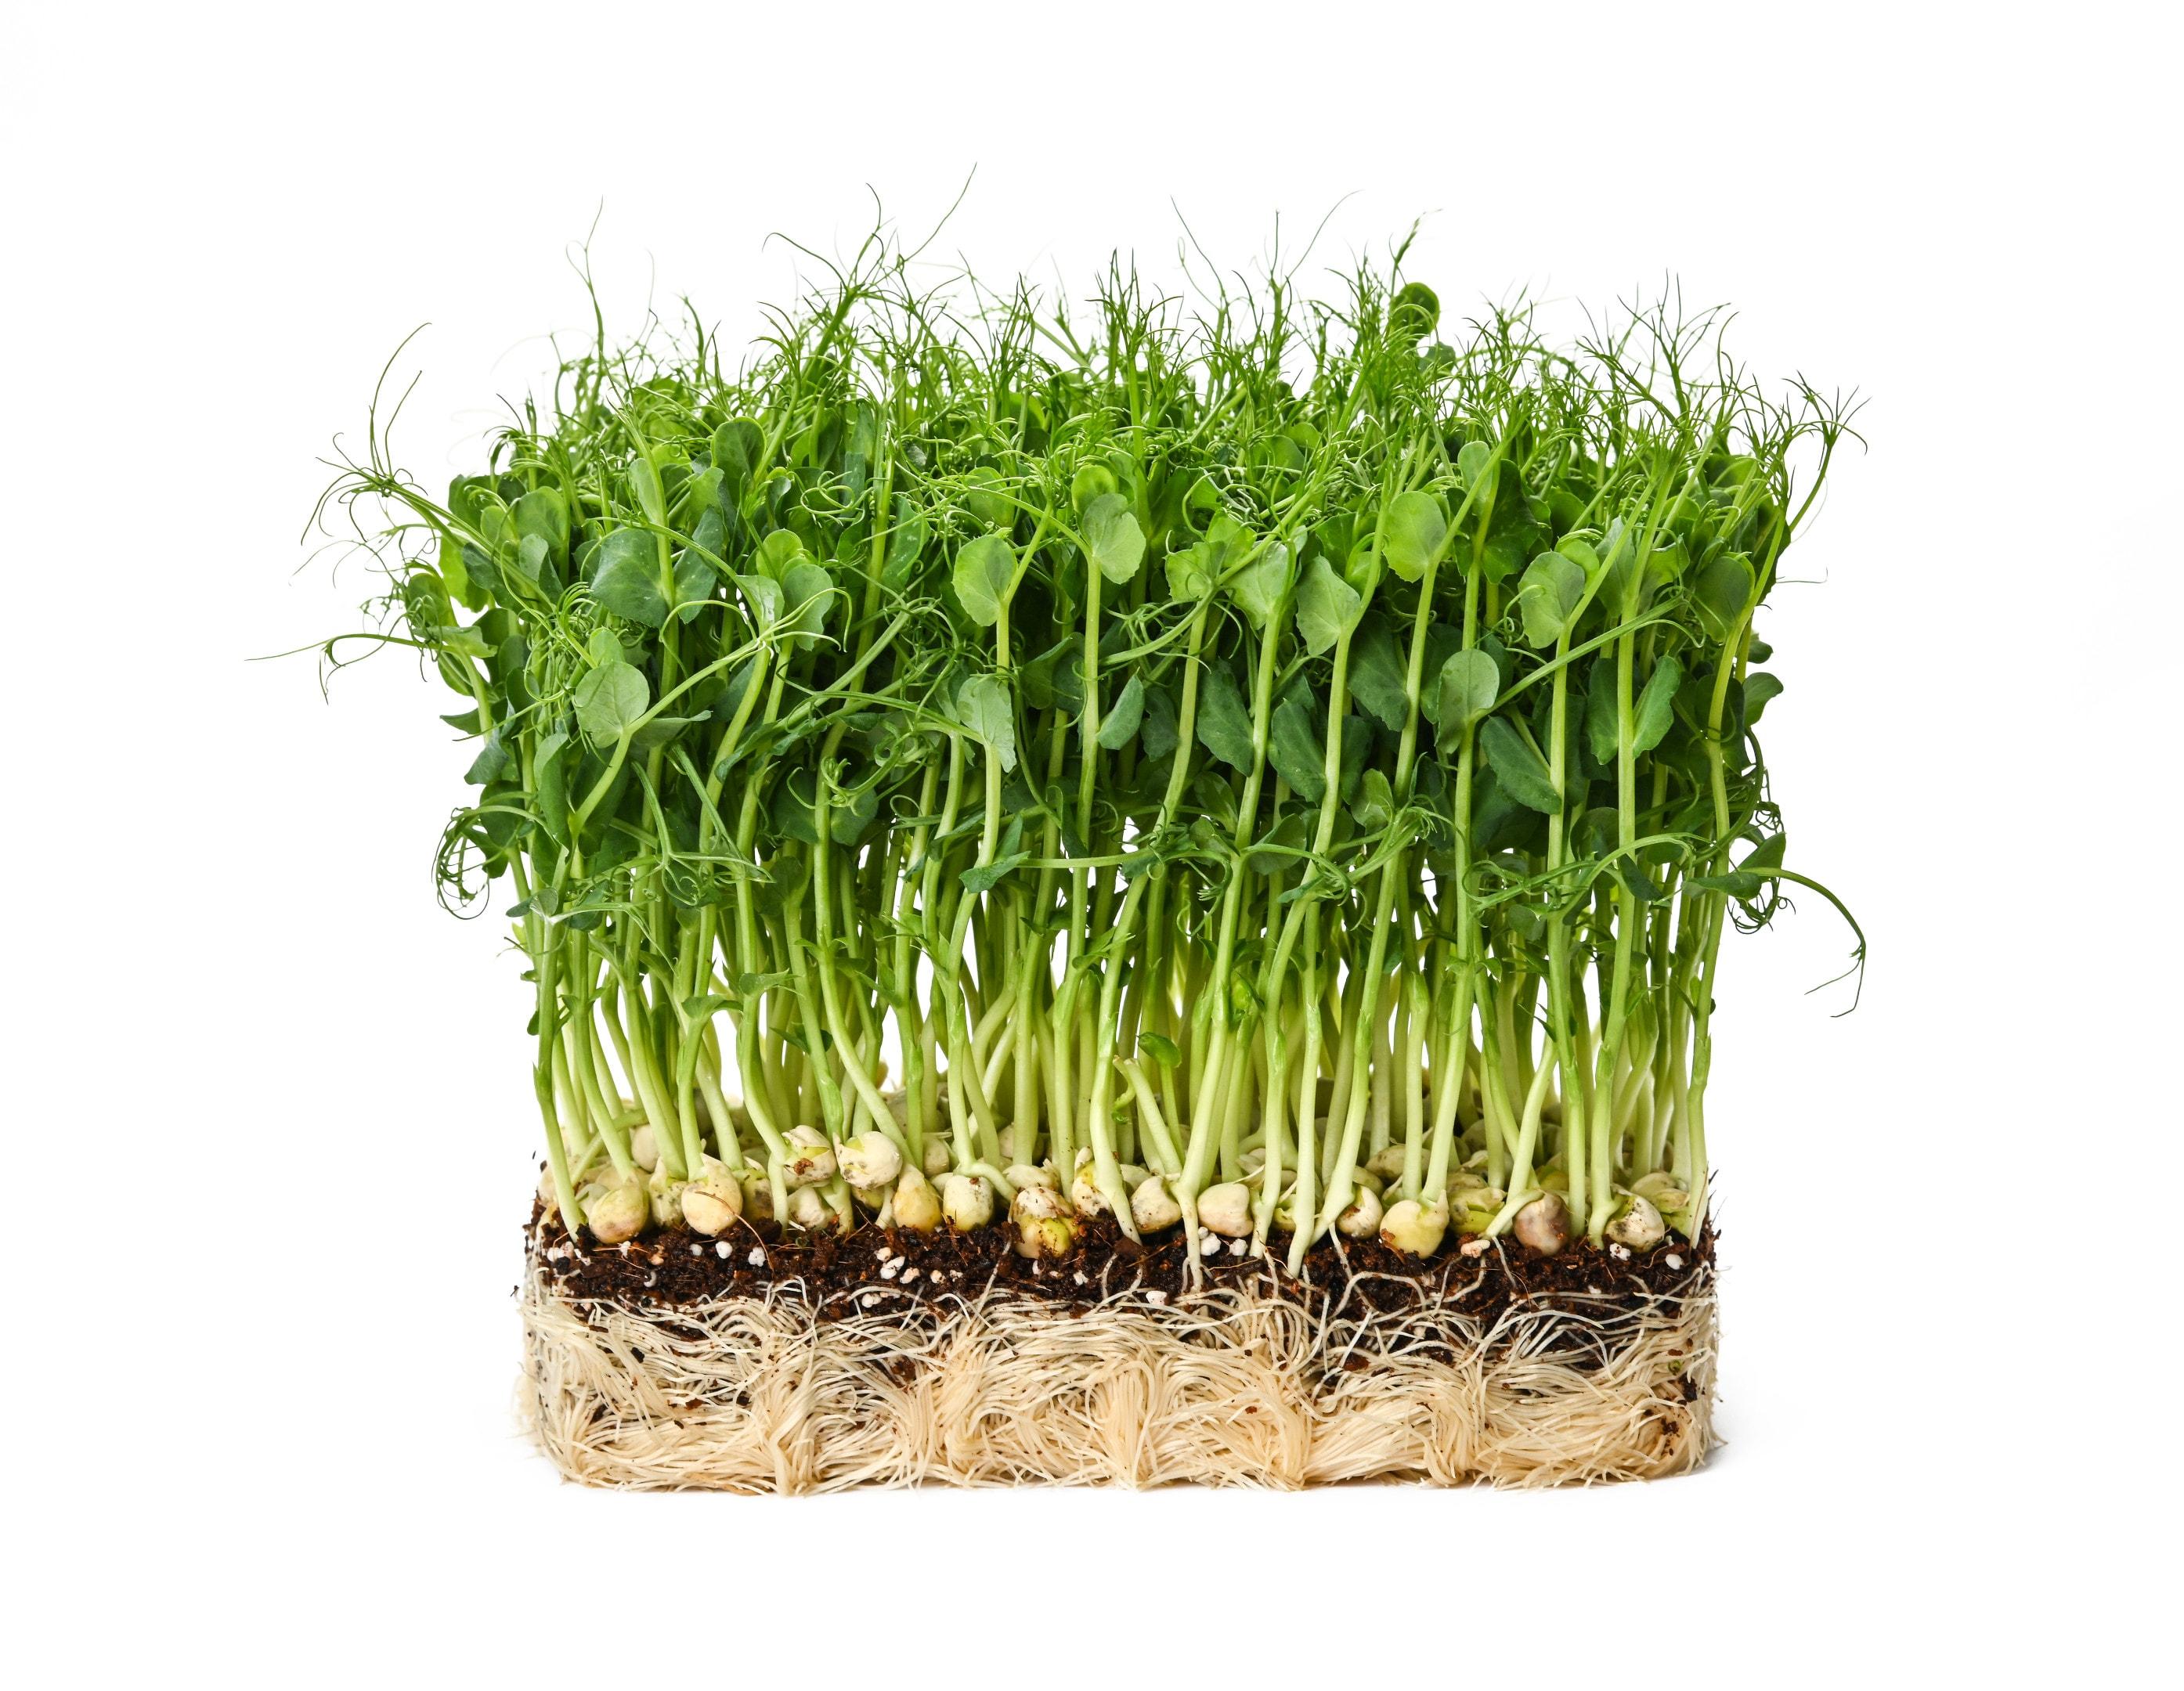 Fresh green peas microgreen sprouts